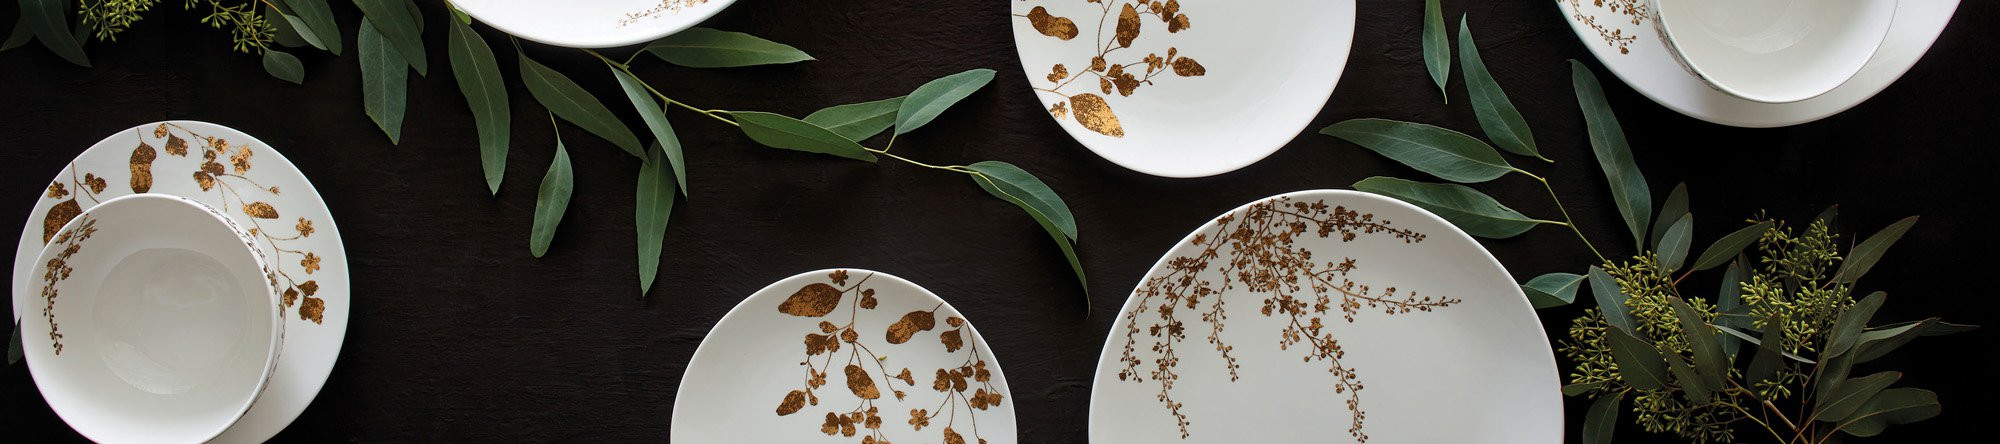 vera wang sequin vase of tableware serving dishes vera wang jardin wedgwooda uk intended for vera wang jardin